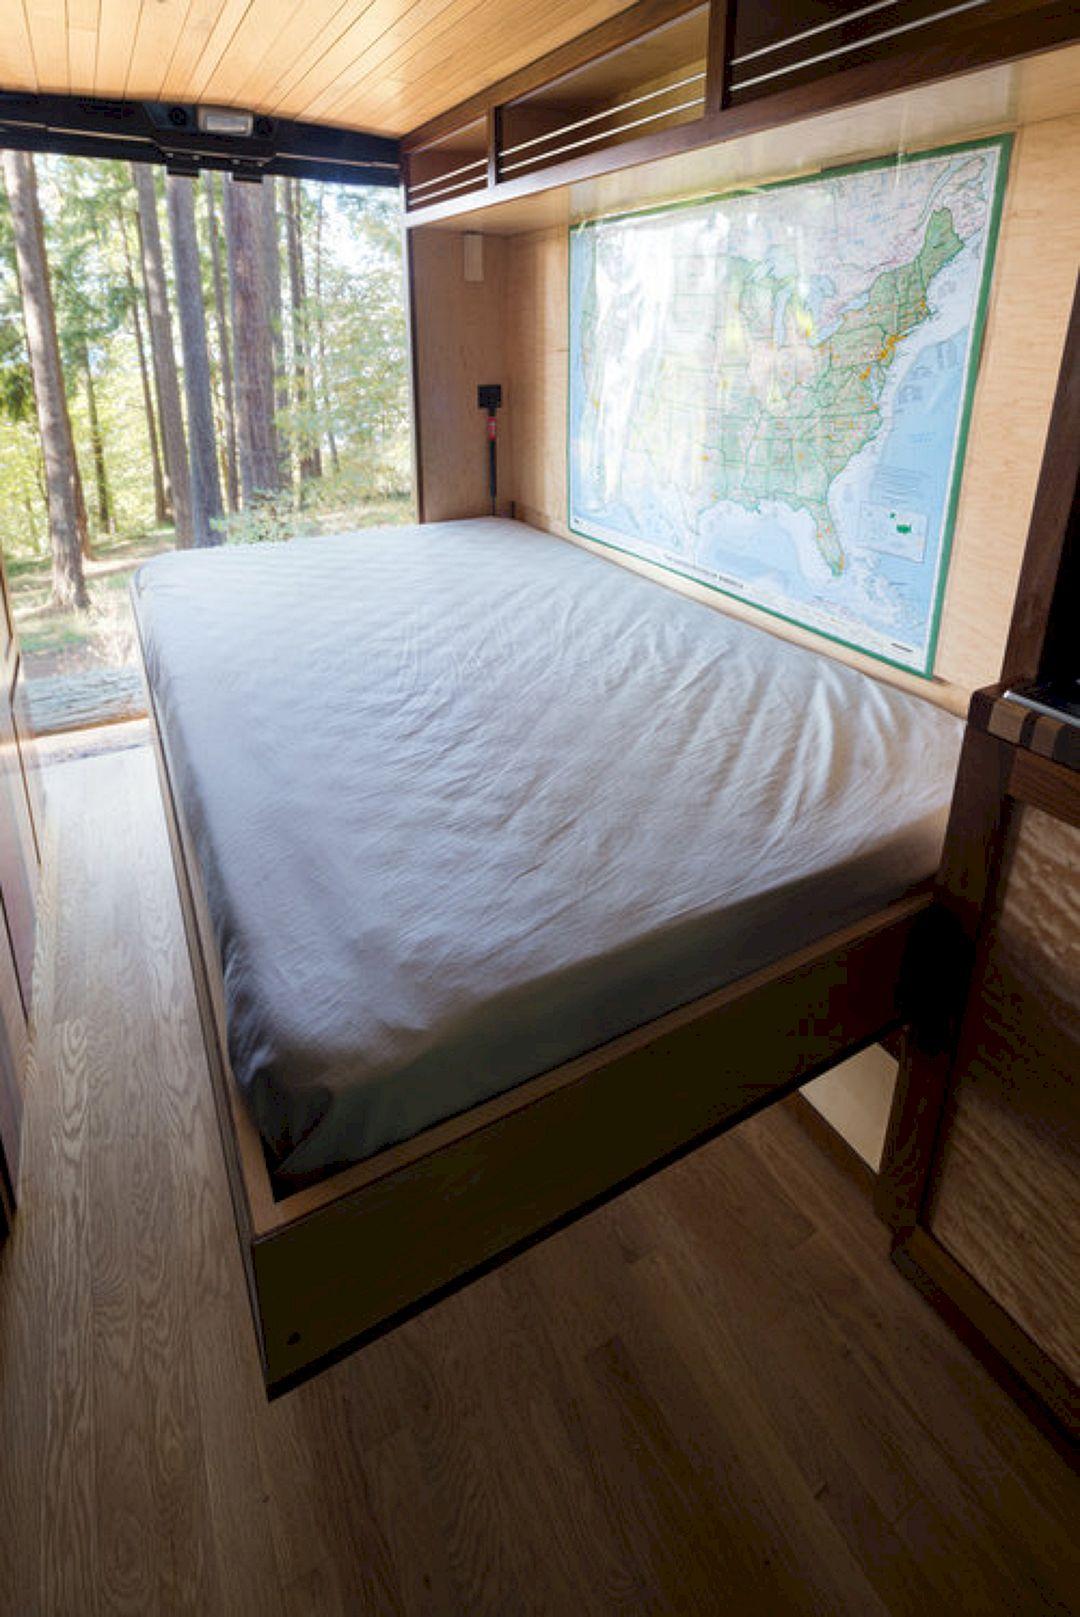 Interior design ideas for camper van no 48 interior design ideas for camper van no 48 design - Interior of bed ...